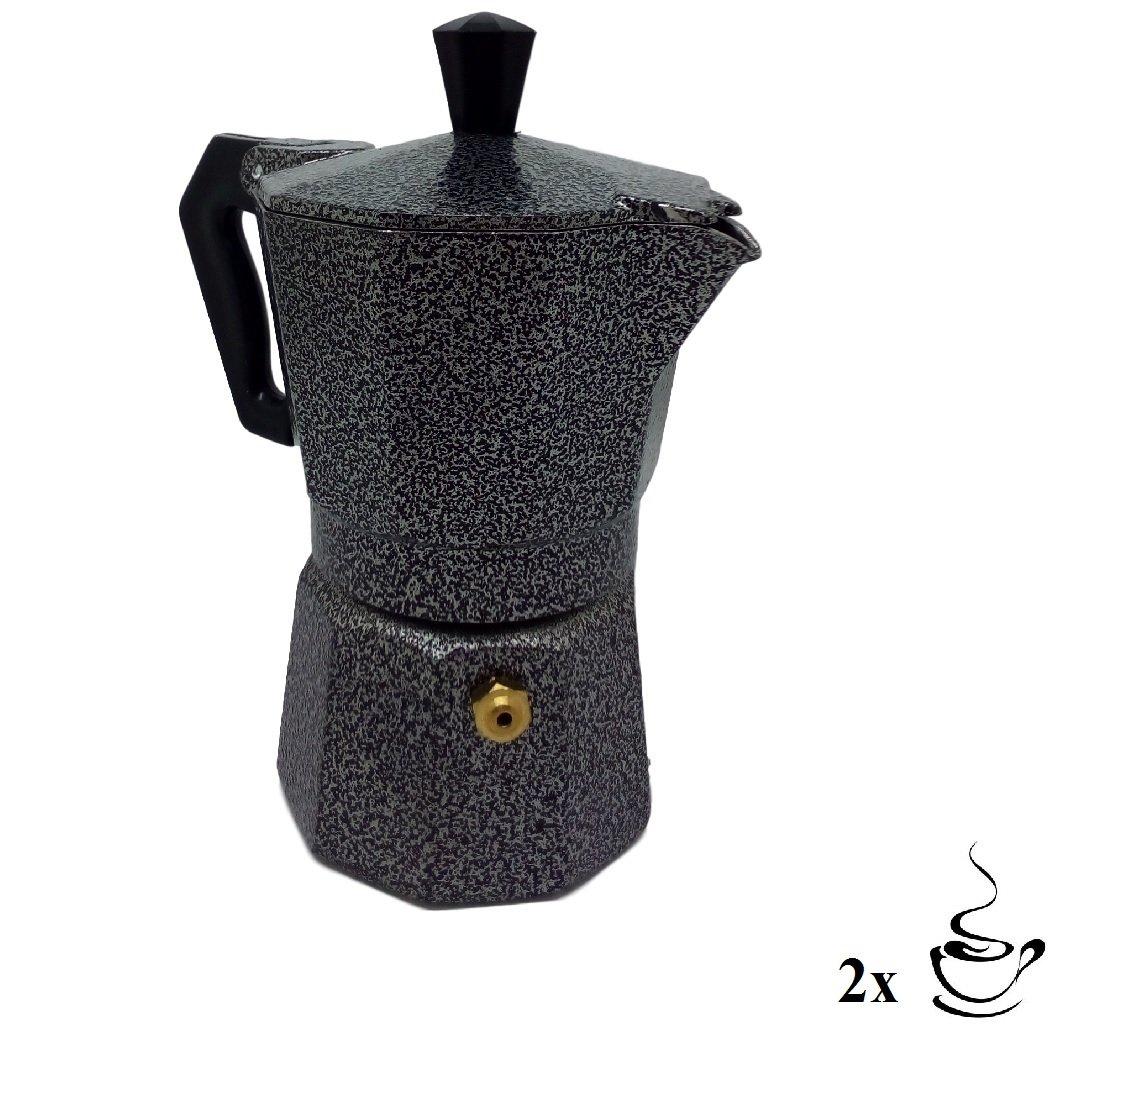 Ducomi Moka Express - Cafetera espresso para 1 taza (Aluminio)